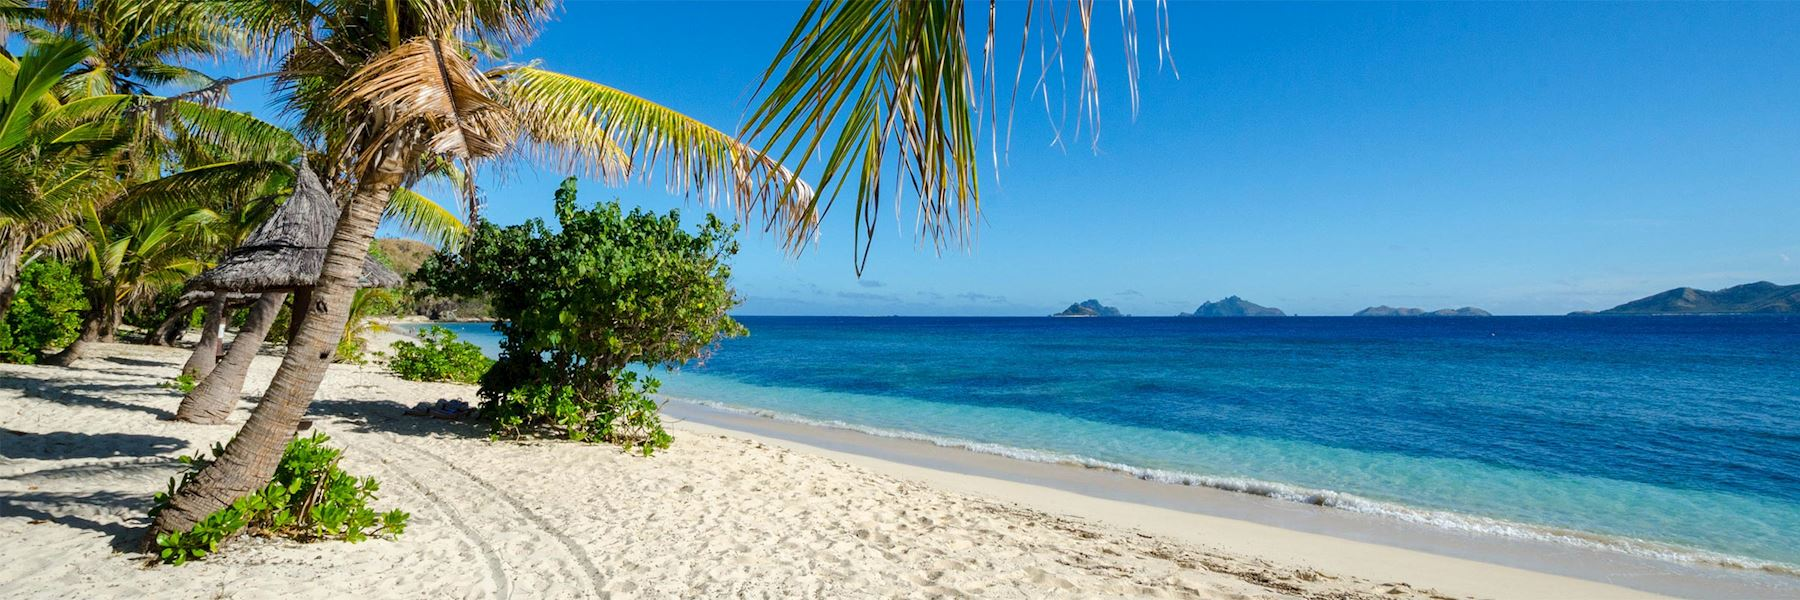 Visit the Mamanuca & Yasawa Islands, Fiji